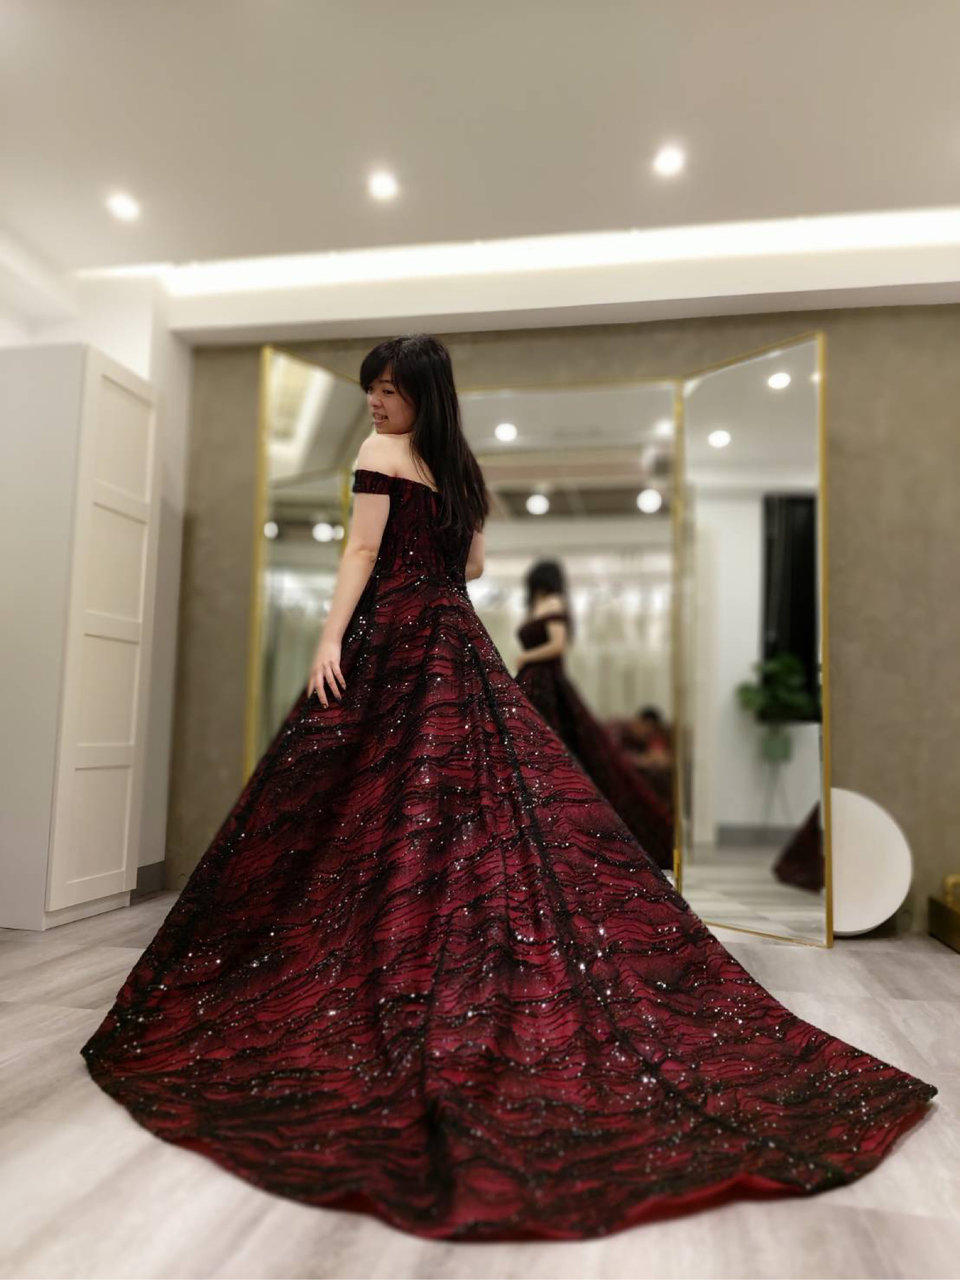 J2 wedding 板橋 手工訂製婚紗,貼心的服務打動人心❤️